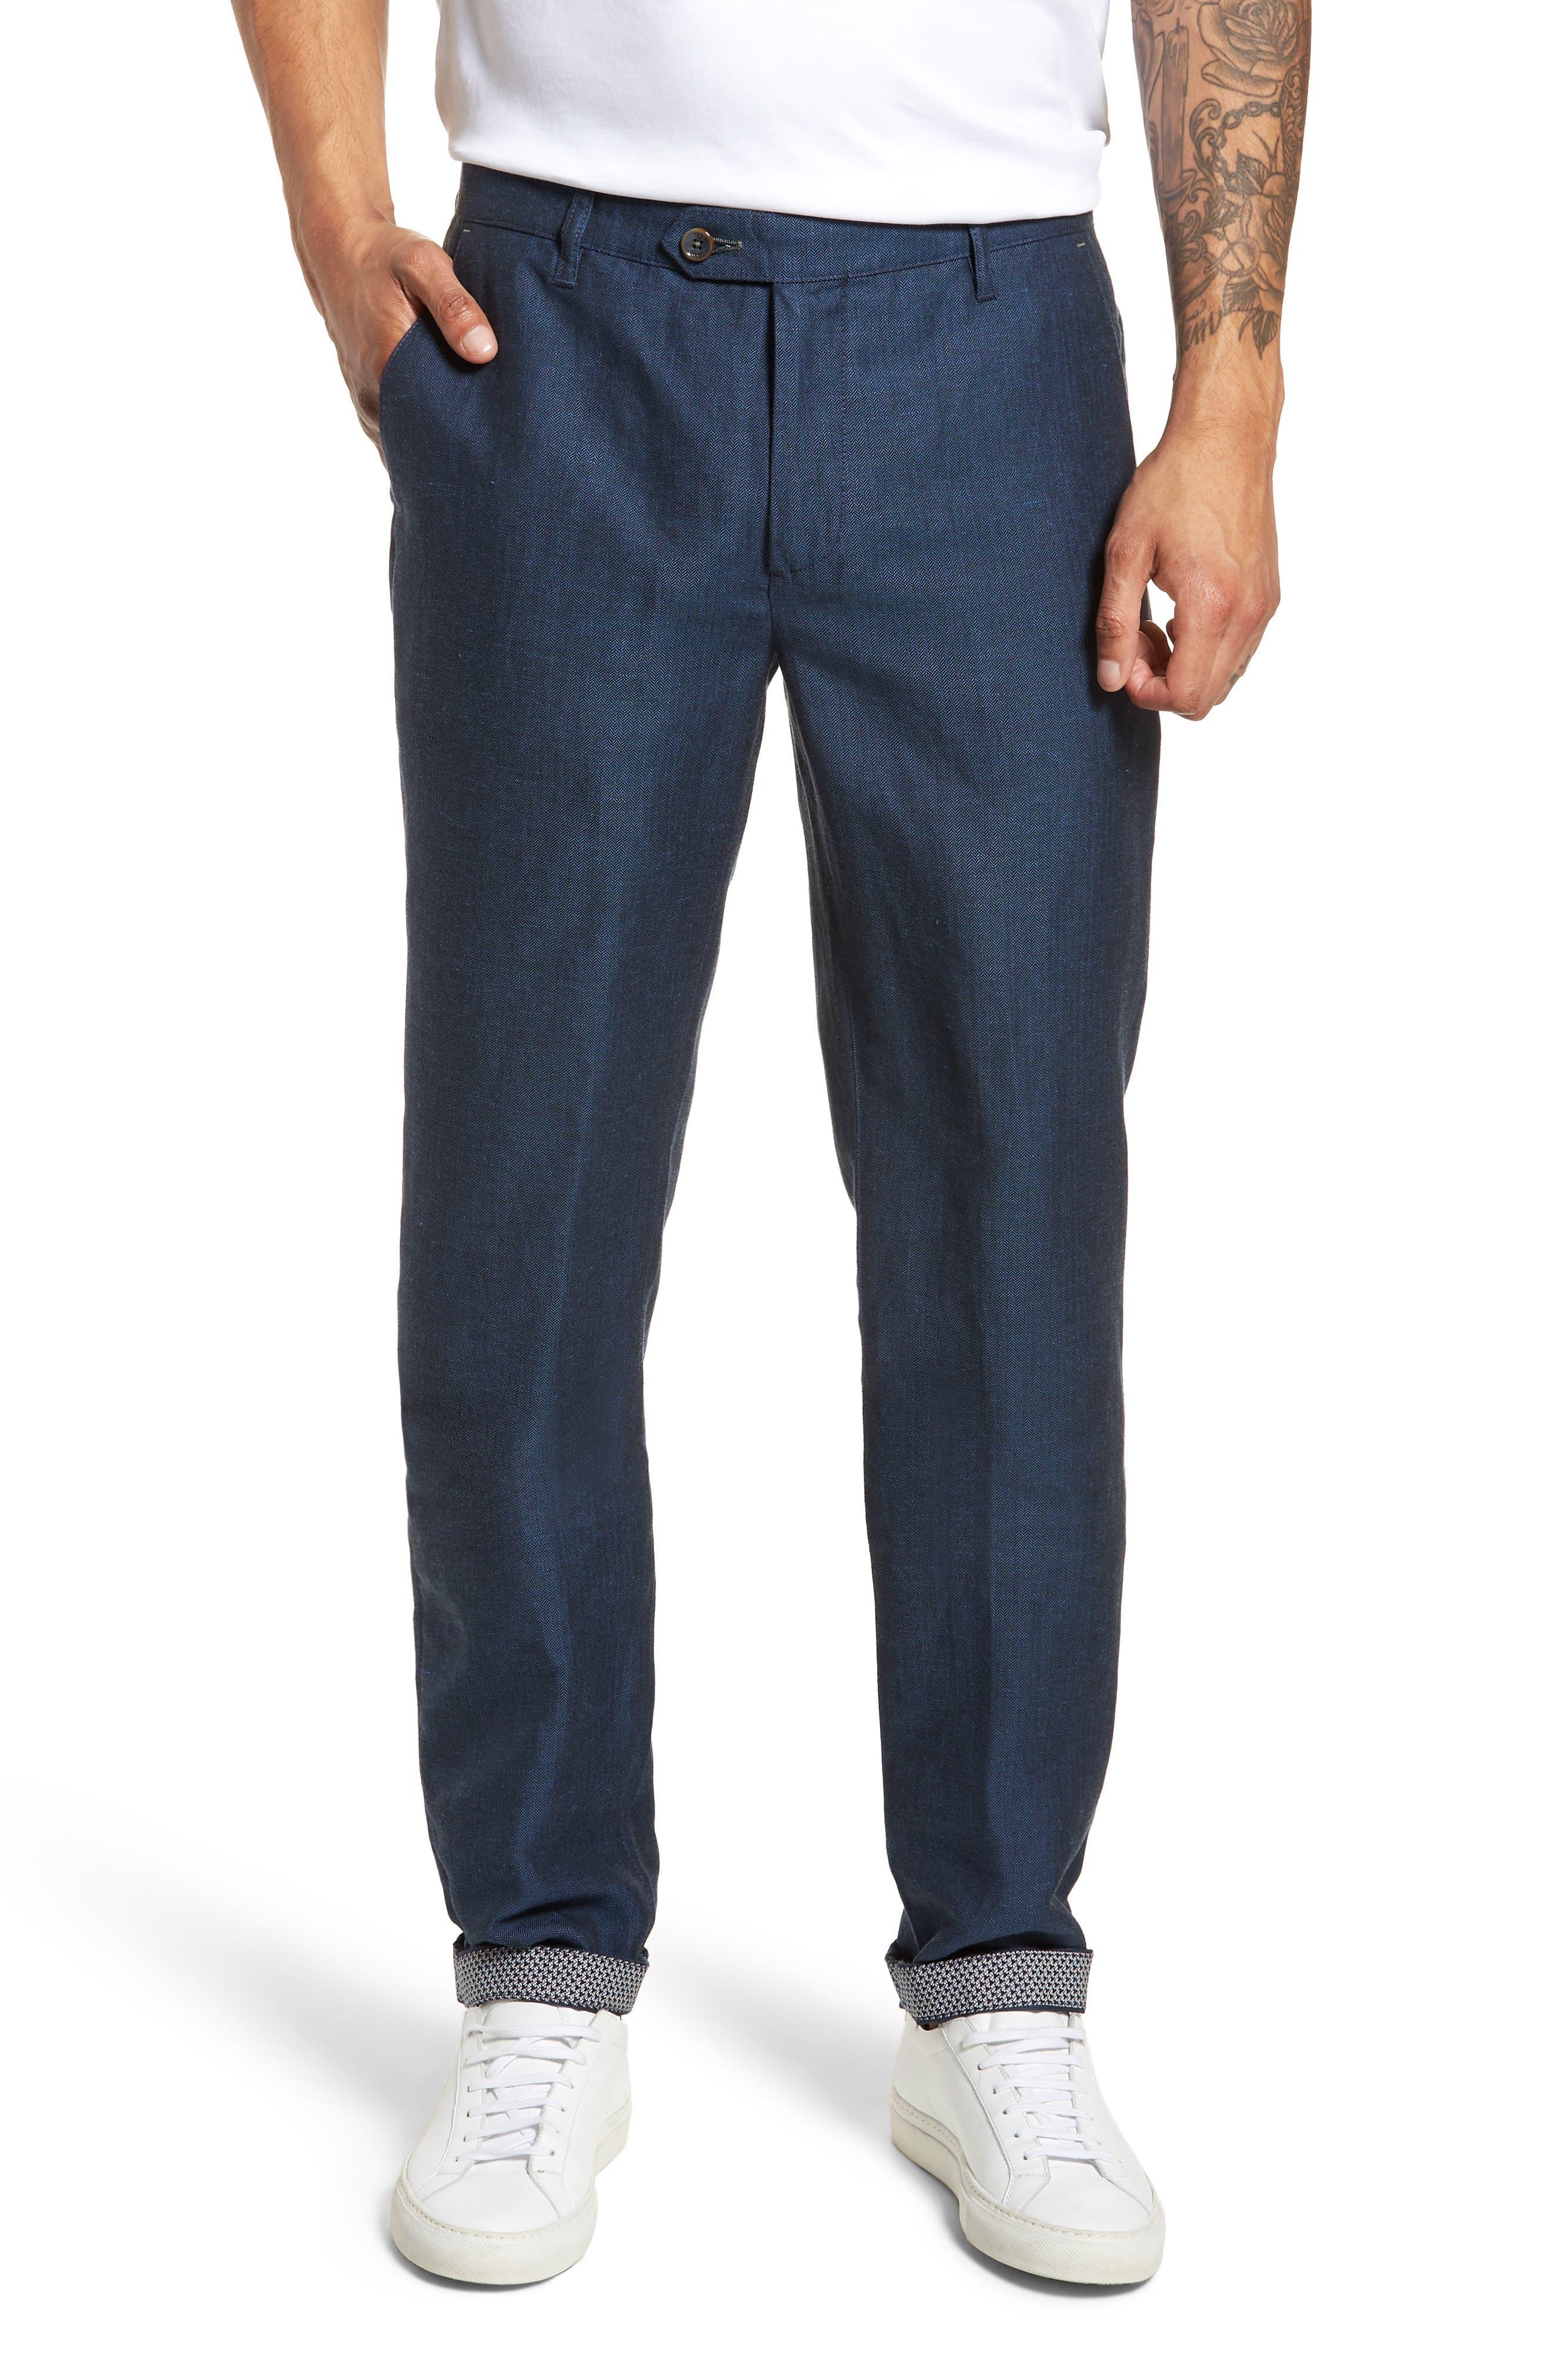 Cazzman Flat Front Stretch Pants,                             Main thumbnail 1, color,                             Navy